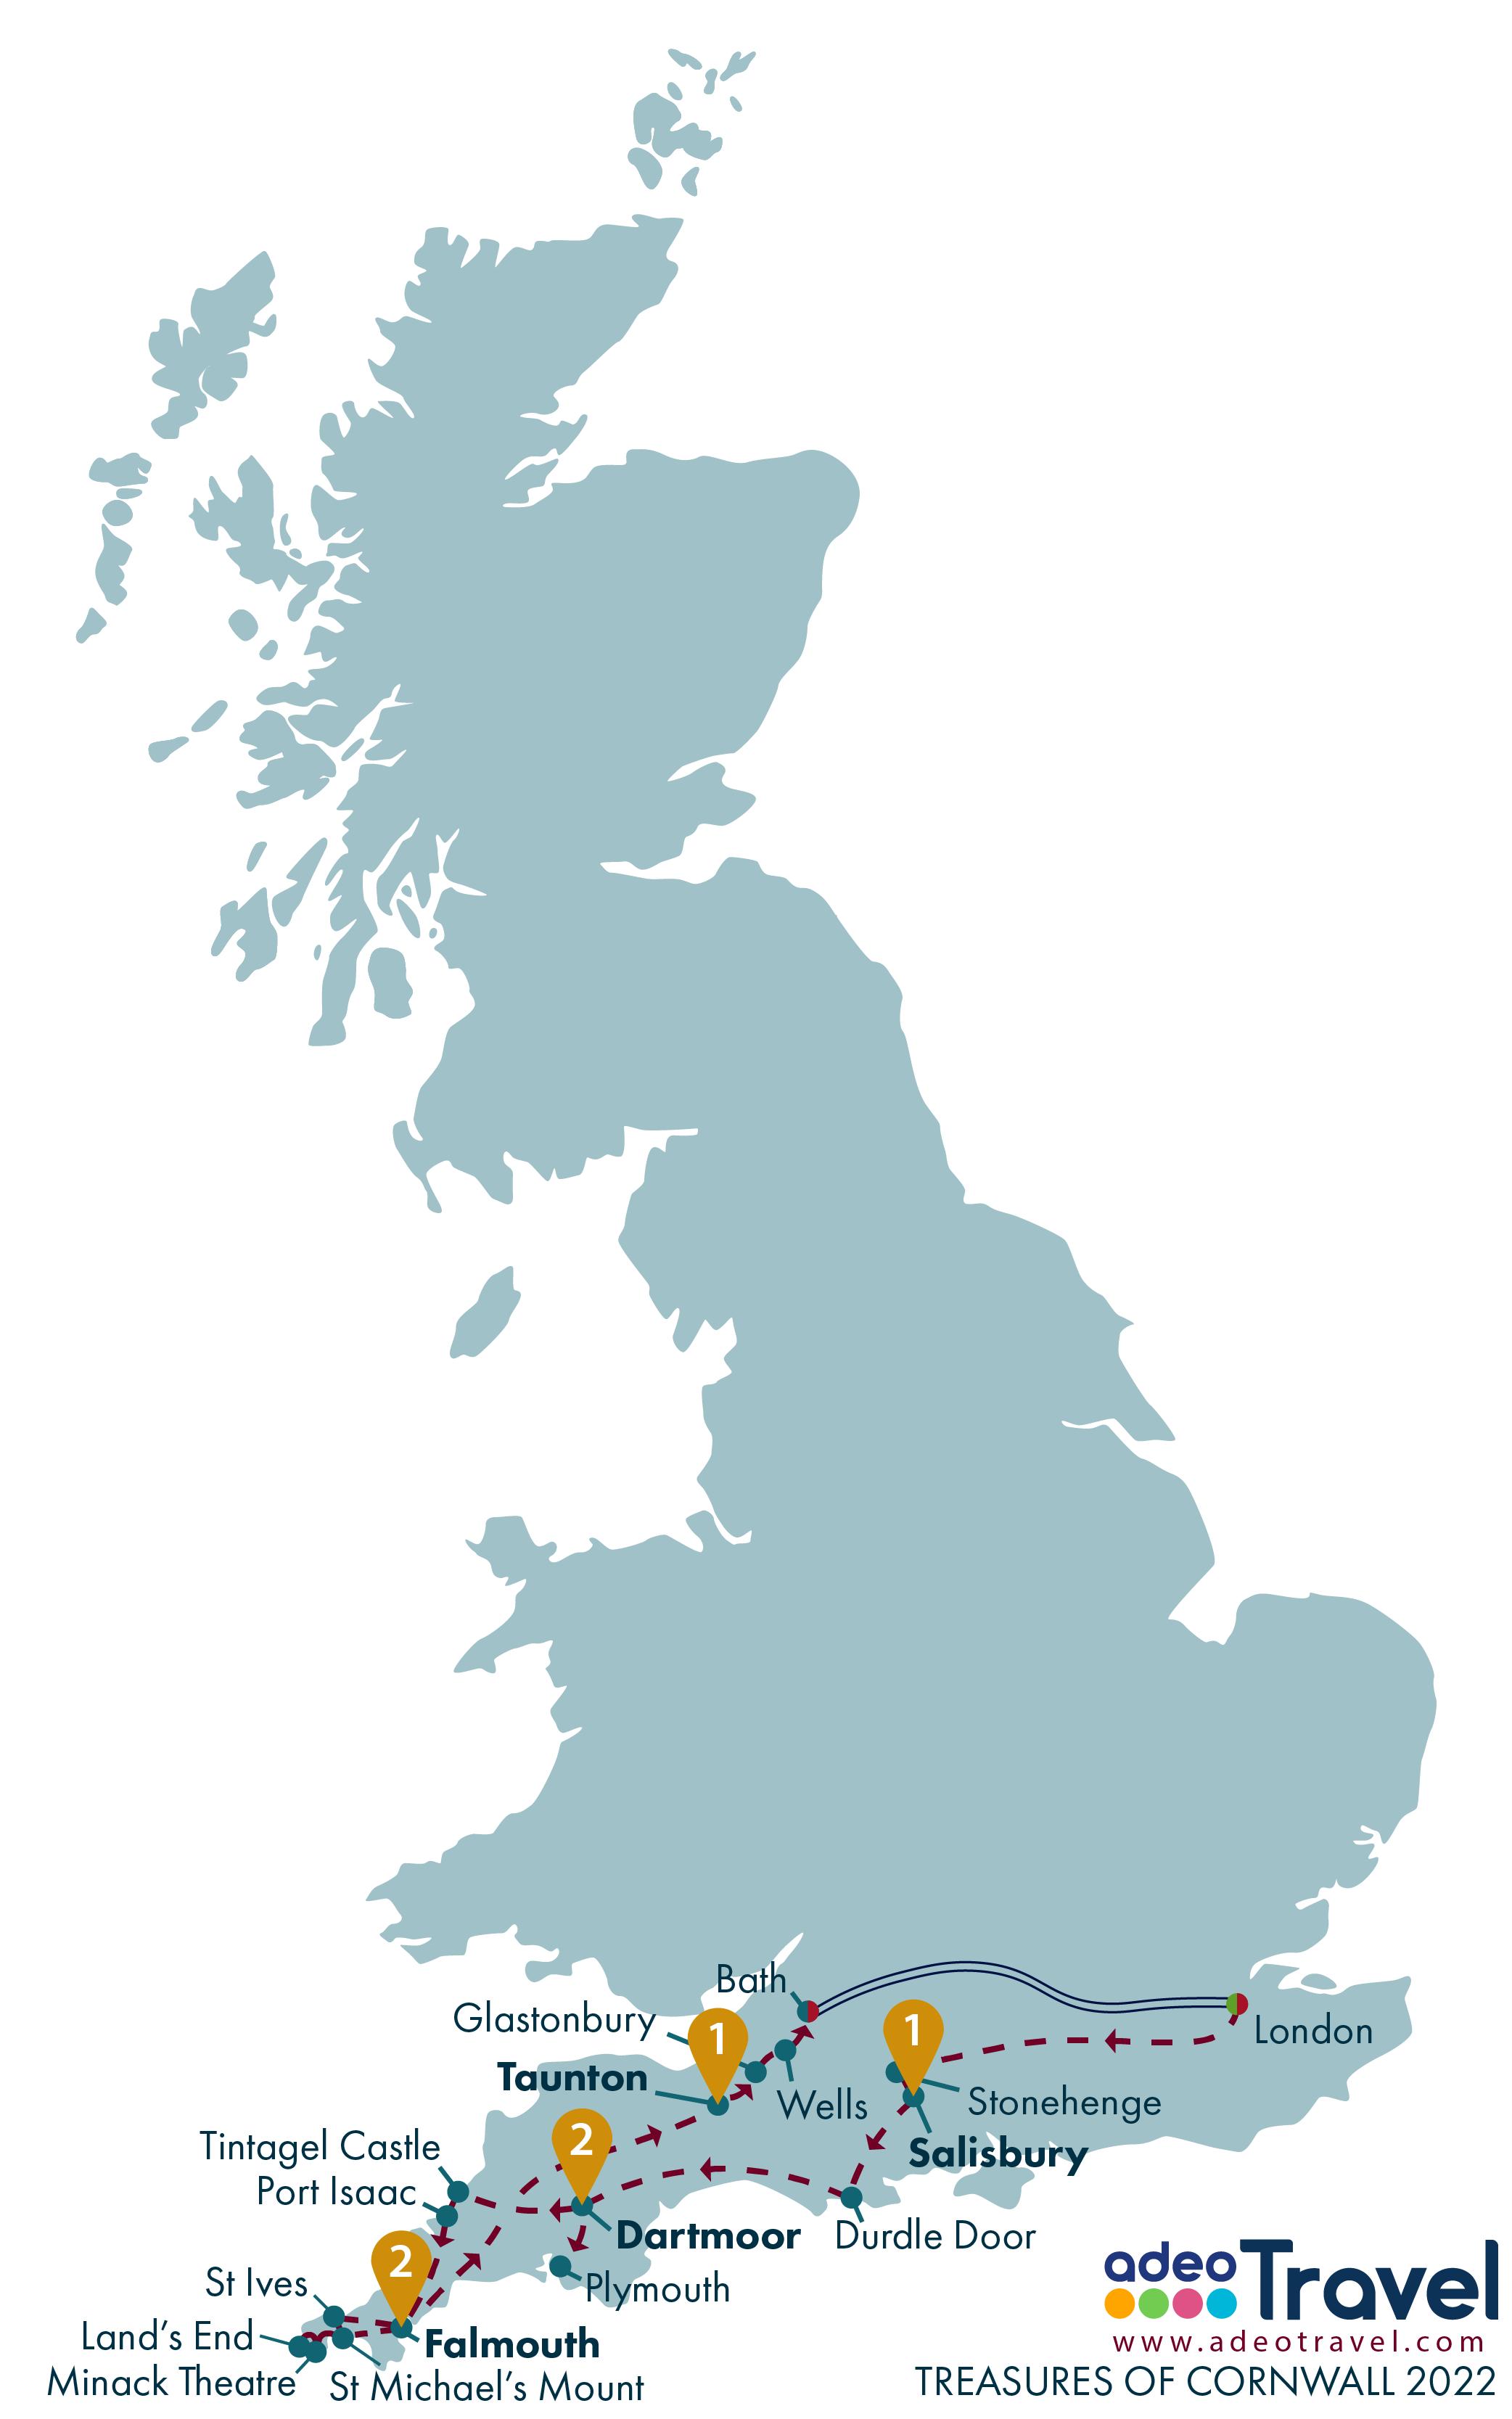 Map - Treasures of Cornwall 2022